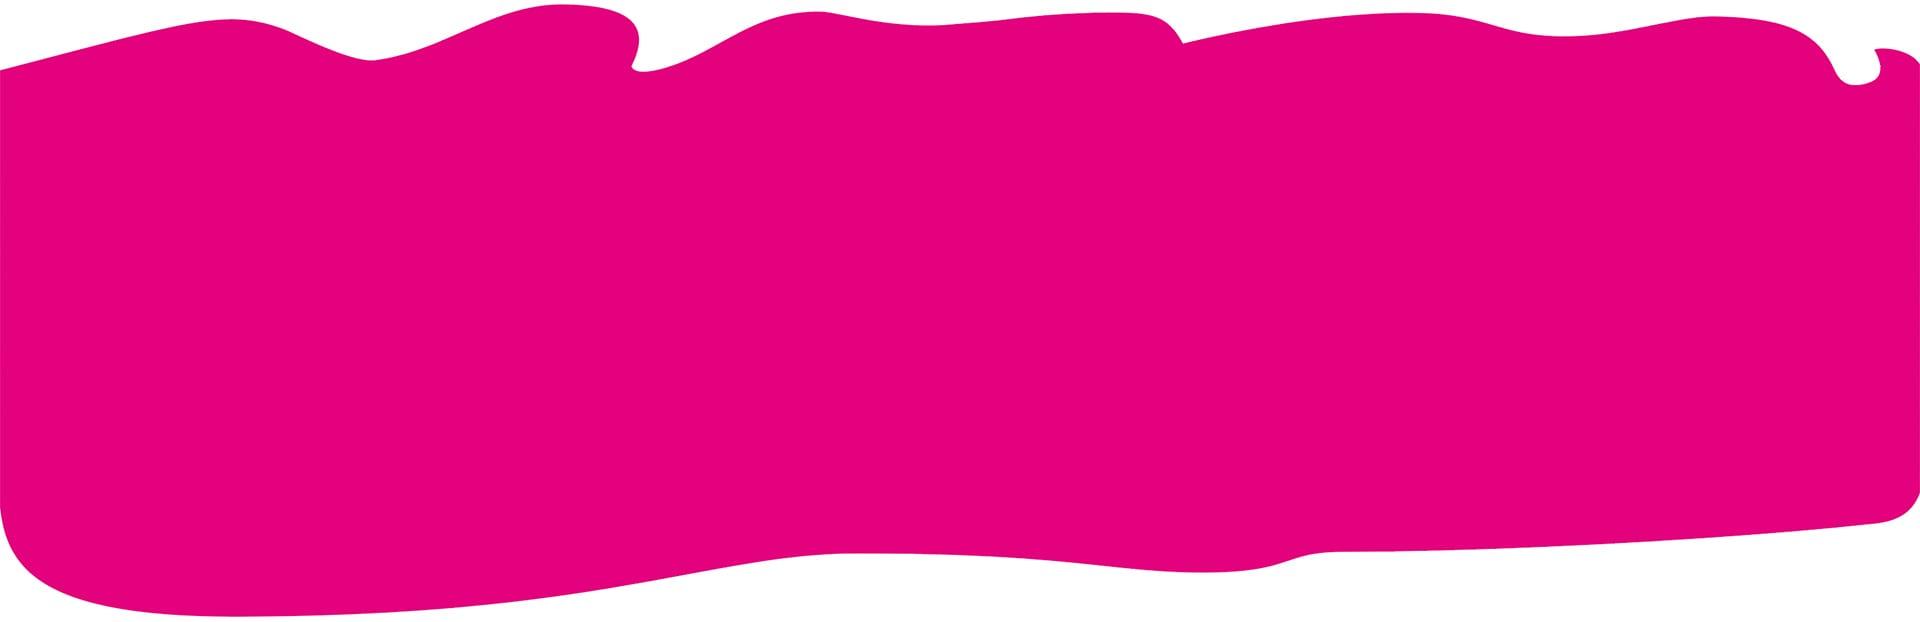 Fondo rosa